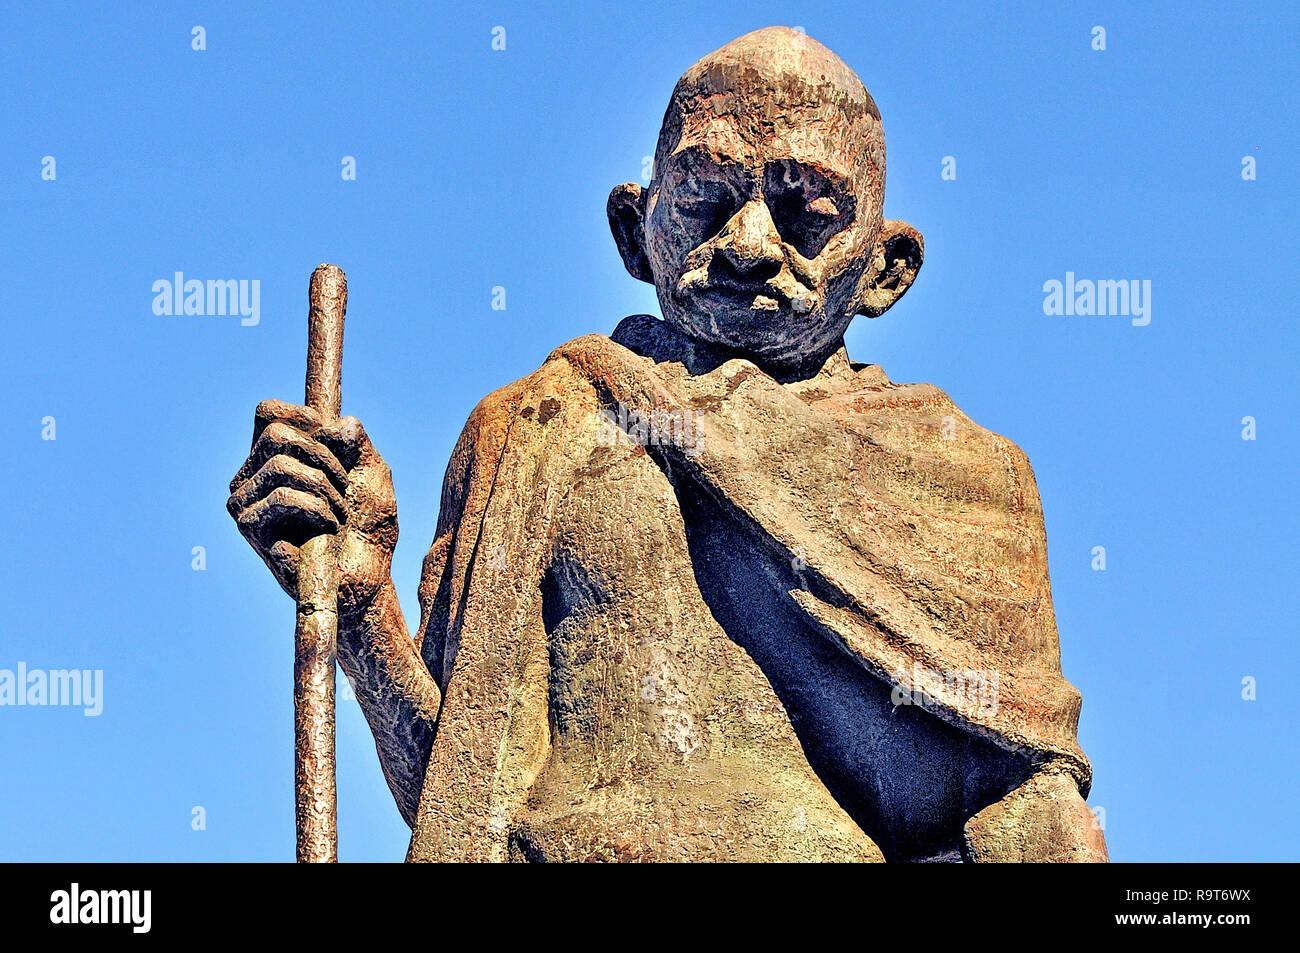 Mahatma Gandhi statue , Praça Mahatma Gandhi, Rio de Janeiro, Brazil - Stock Image